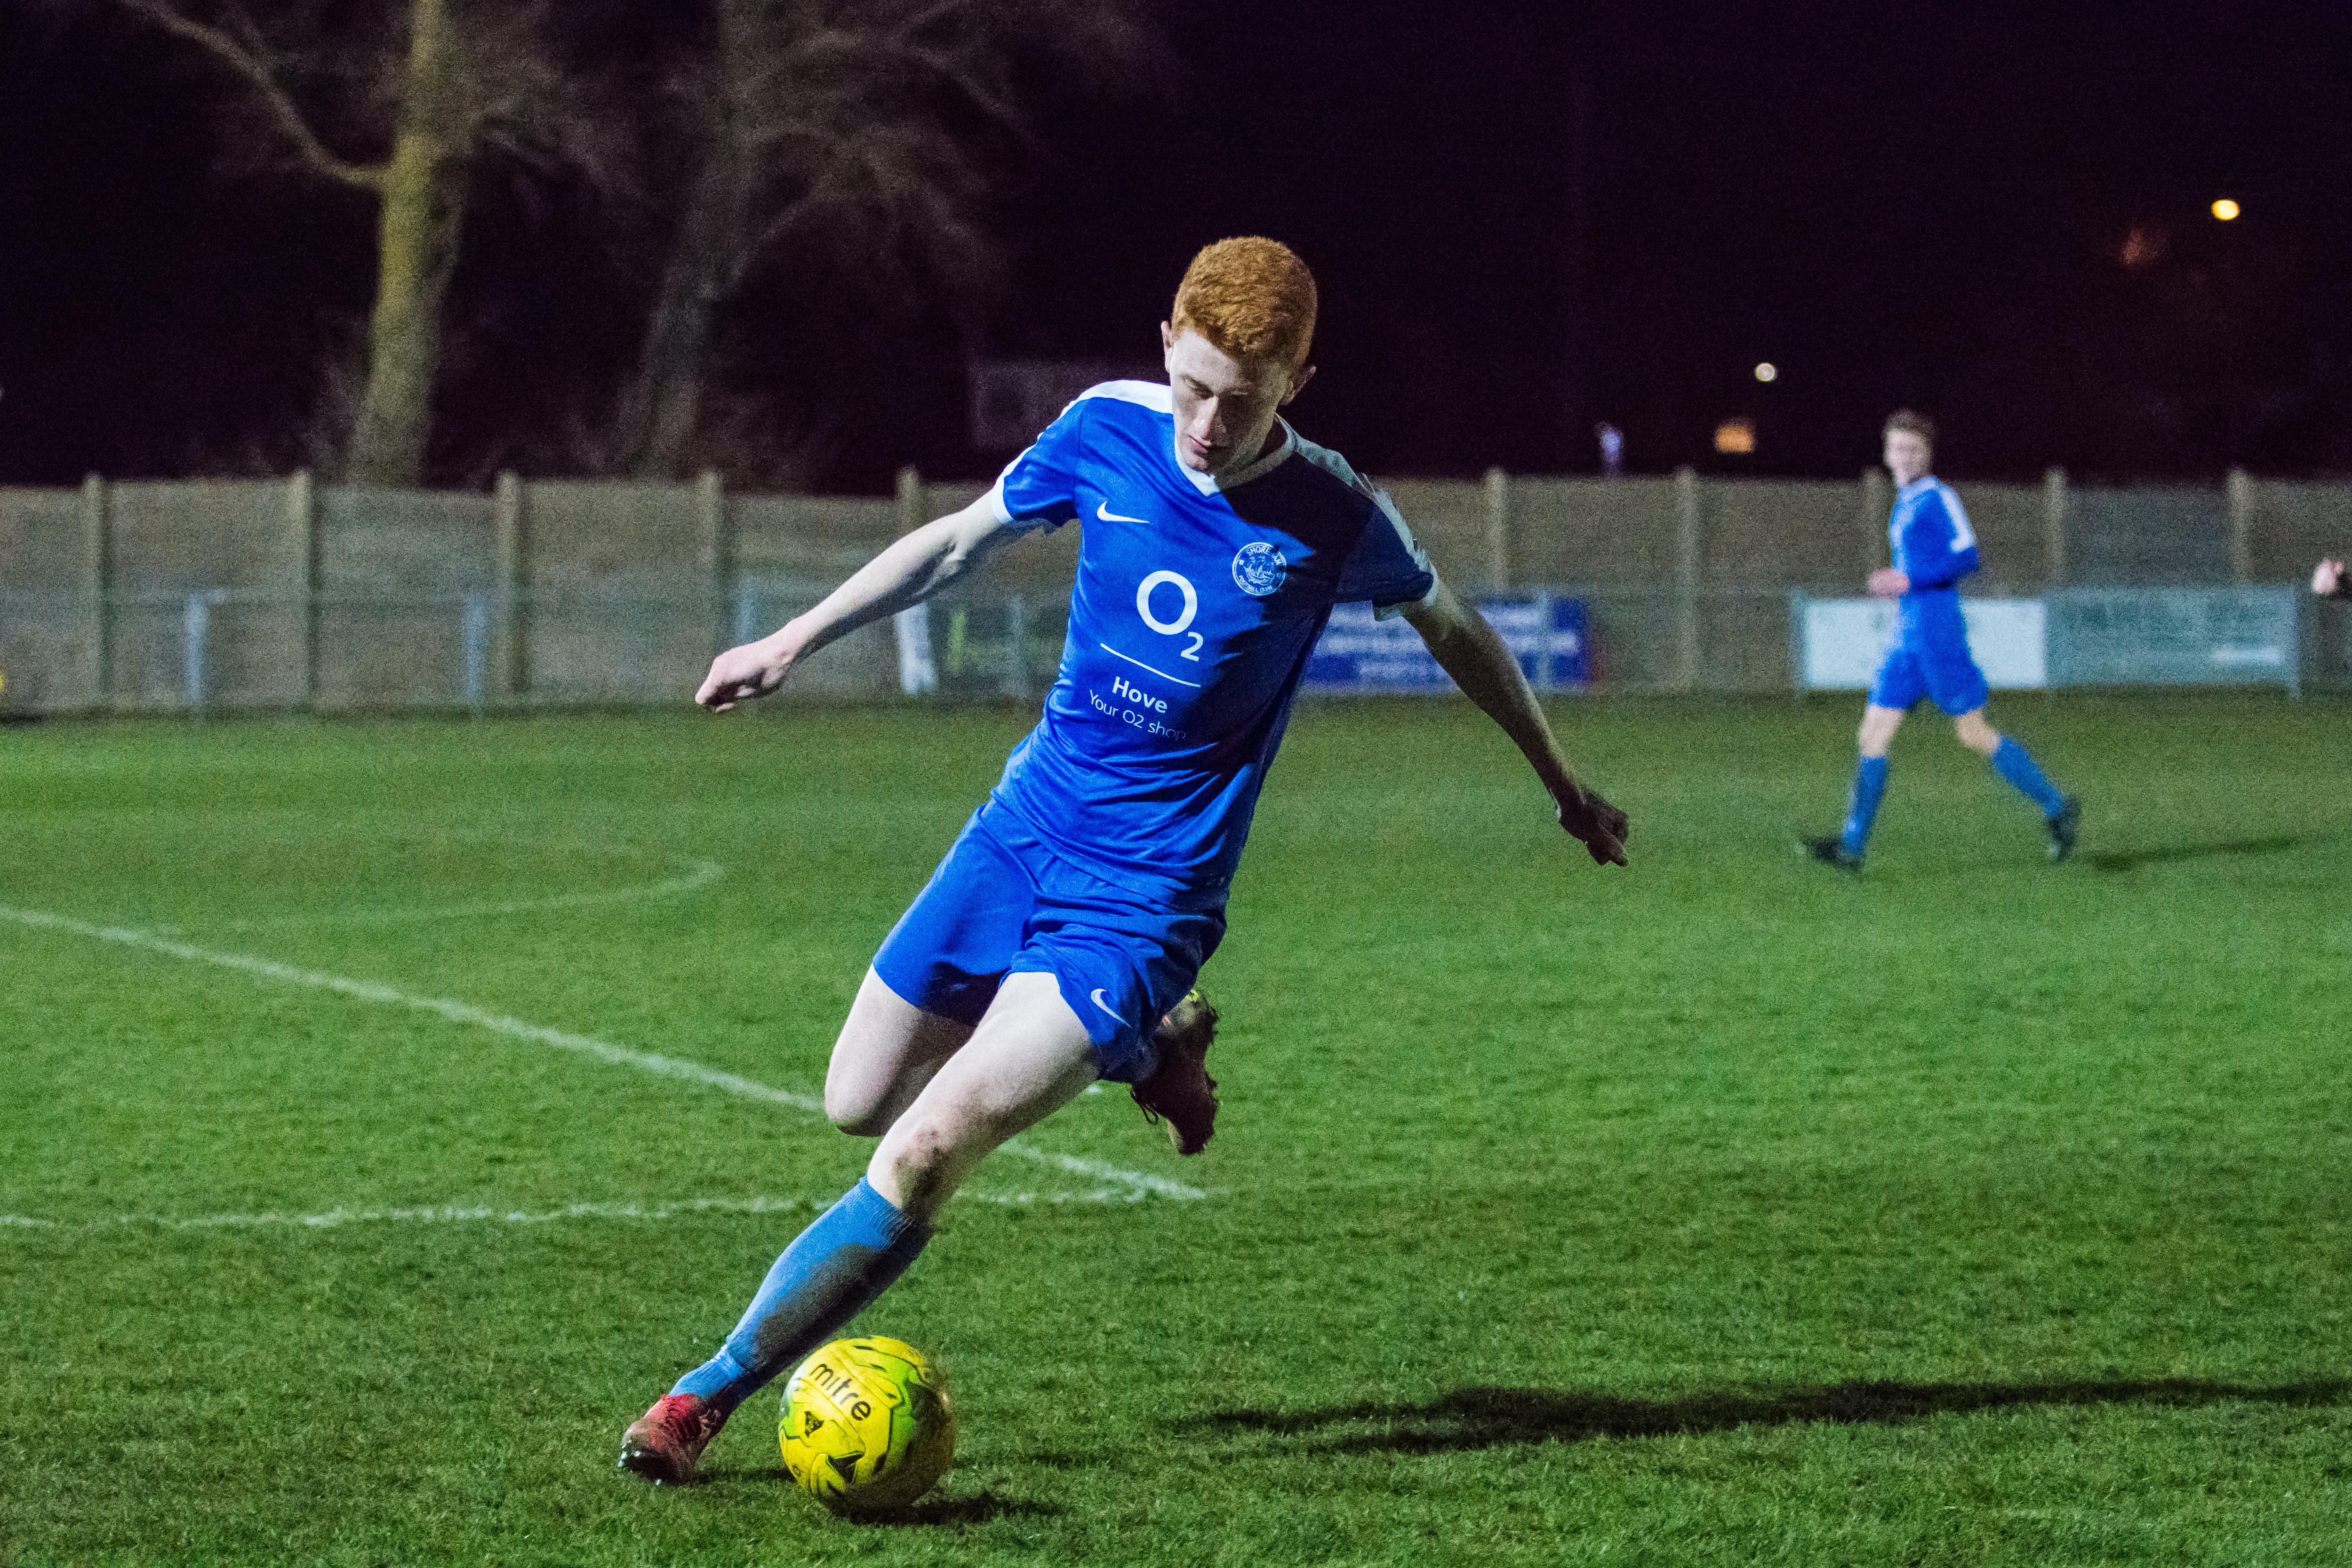 DAVID_JEFFERY Shoreham FC U18s vs Woking FC Academy 22.03.18 55